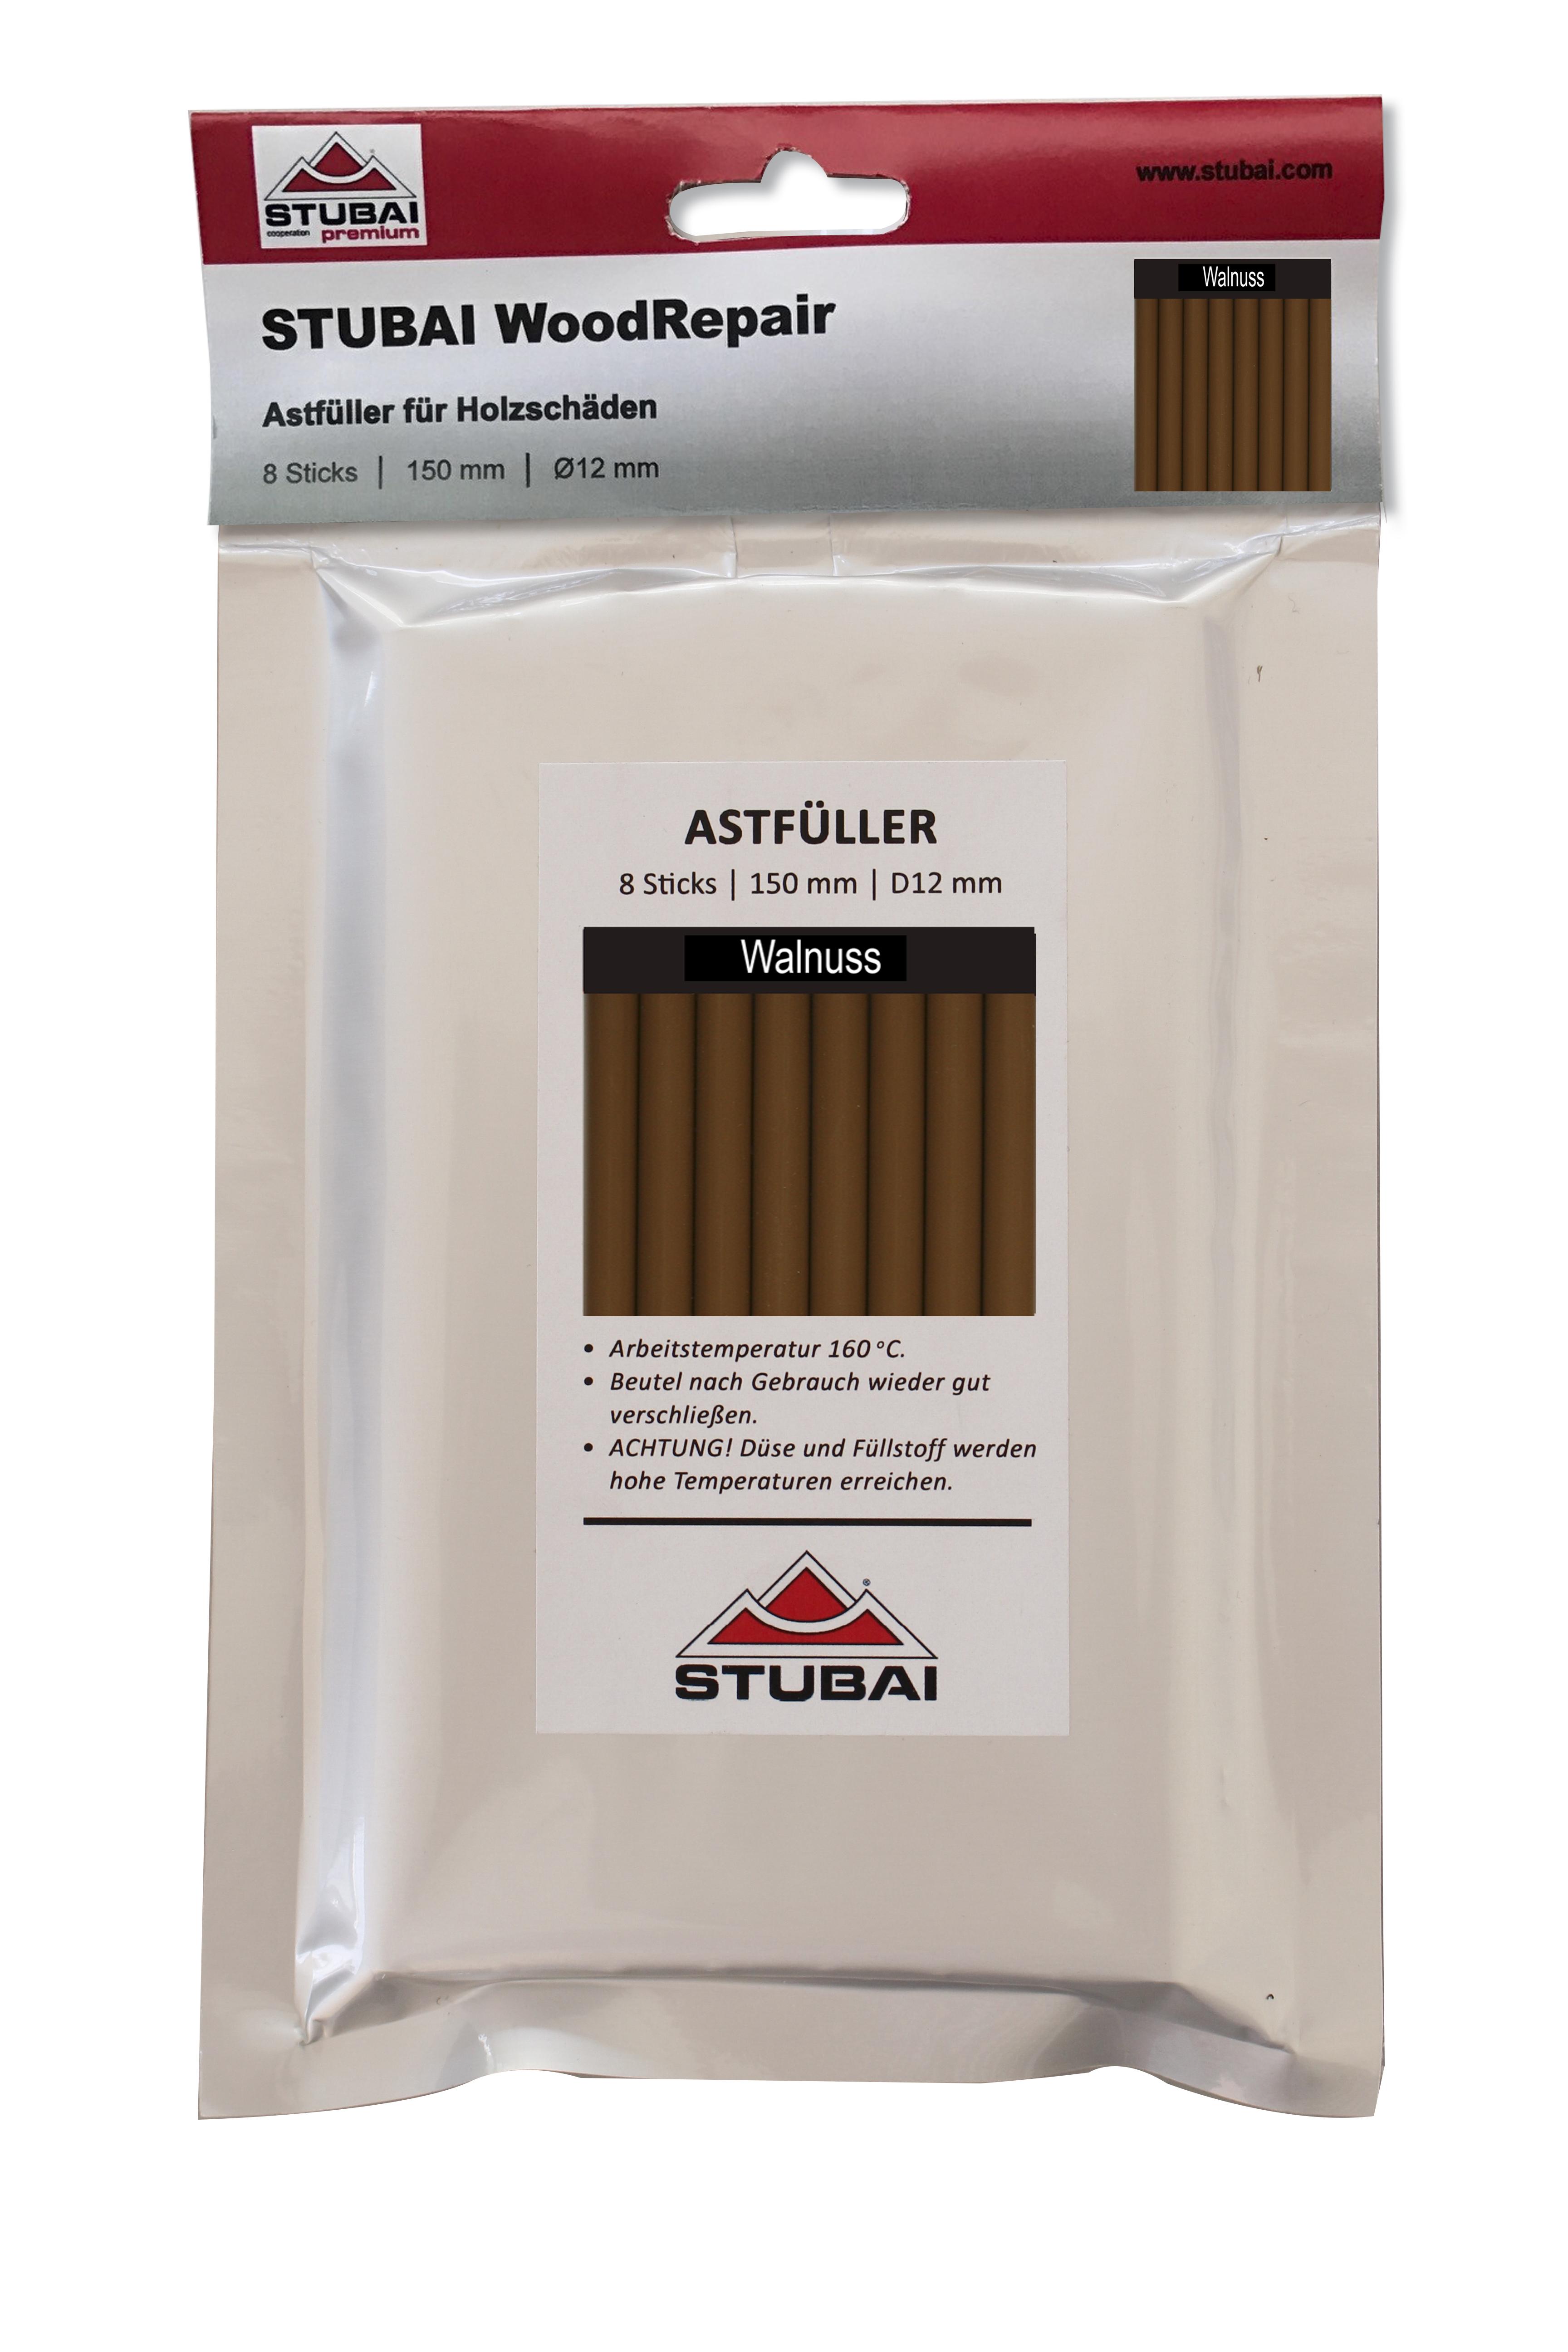 STUBAI WoodRepair 150 mm 8 Sticks Buche